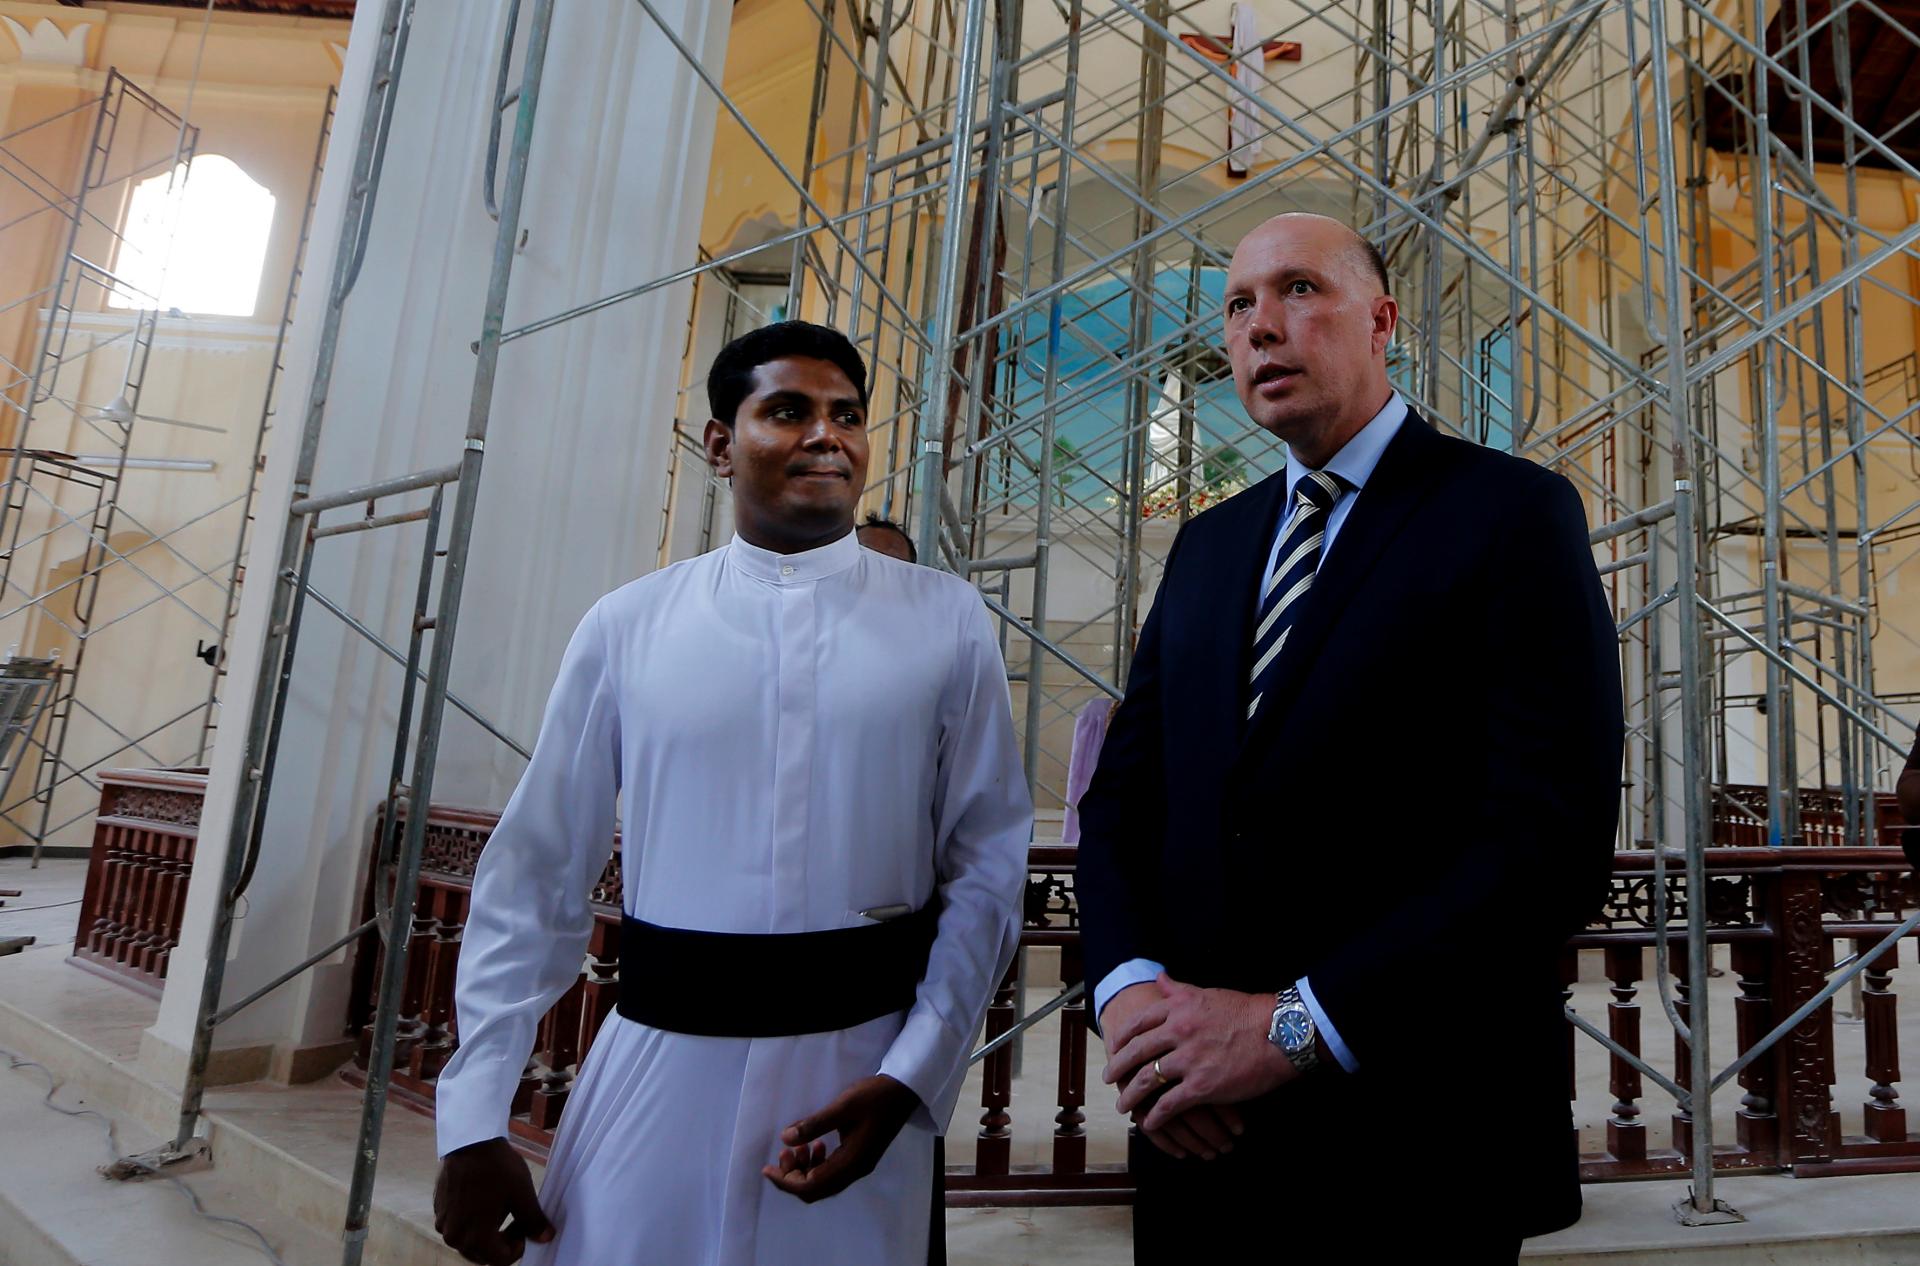 Aussie home minister lays wreath at bombed Sri Lanka church